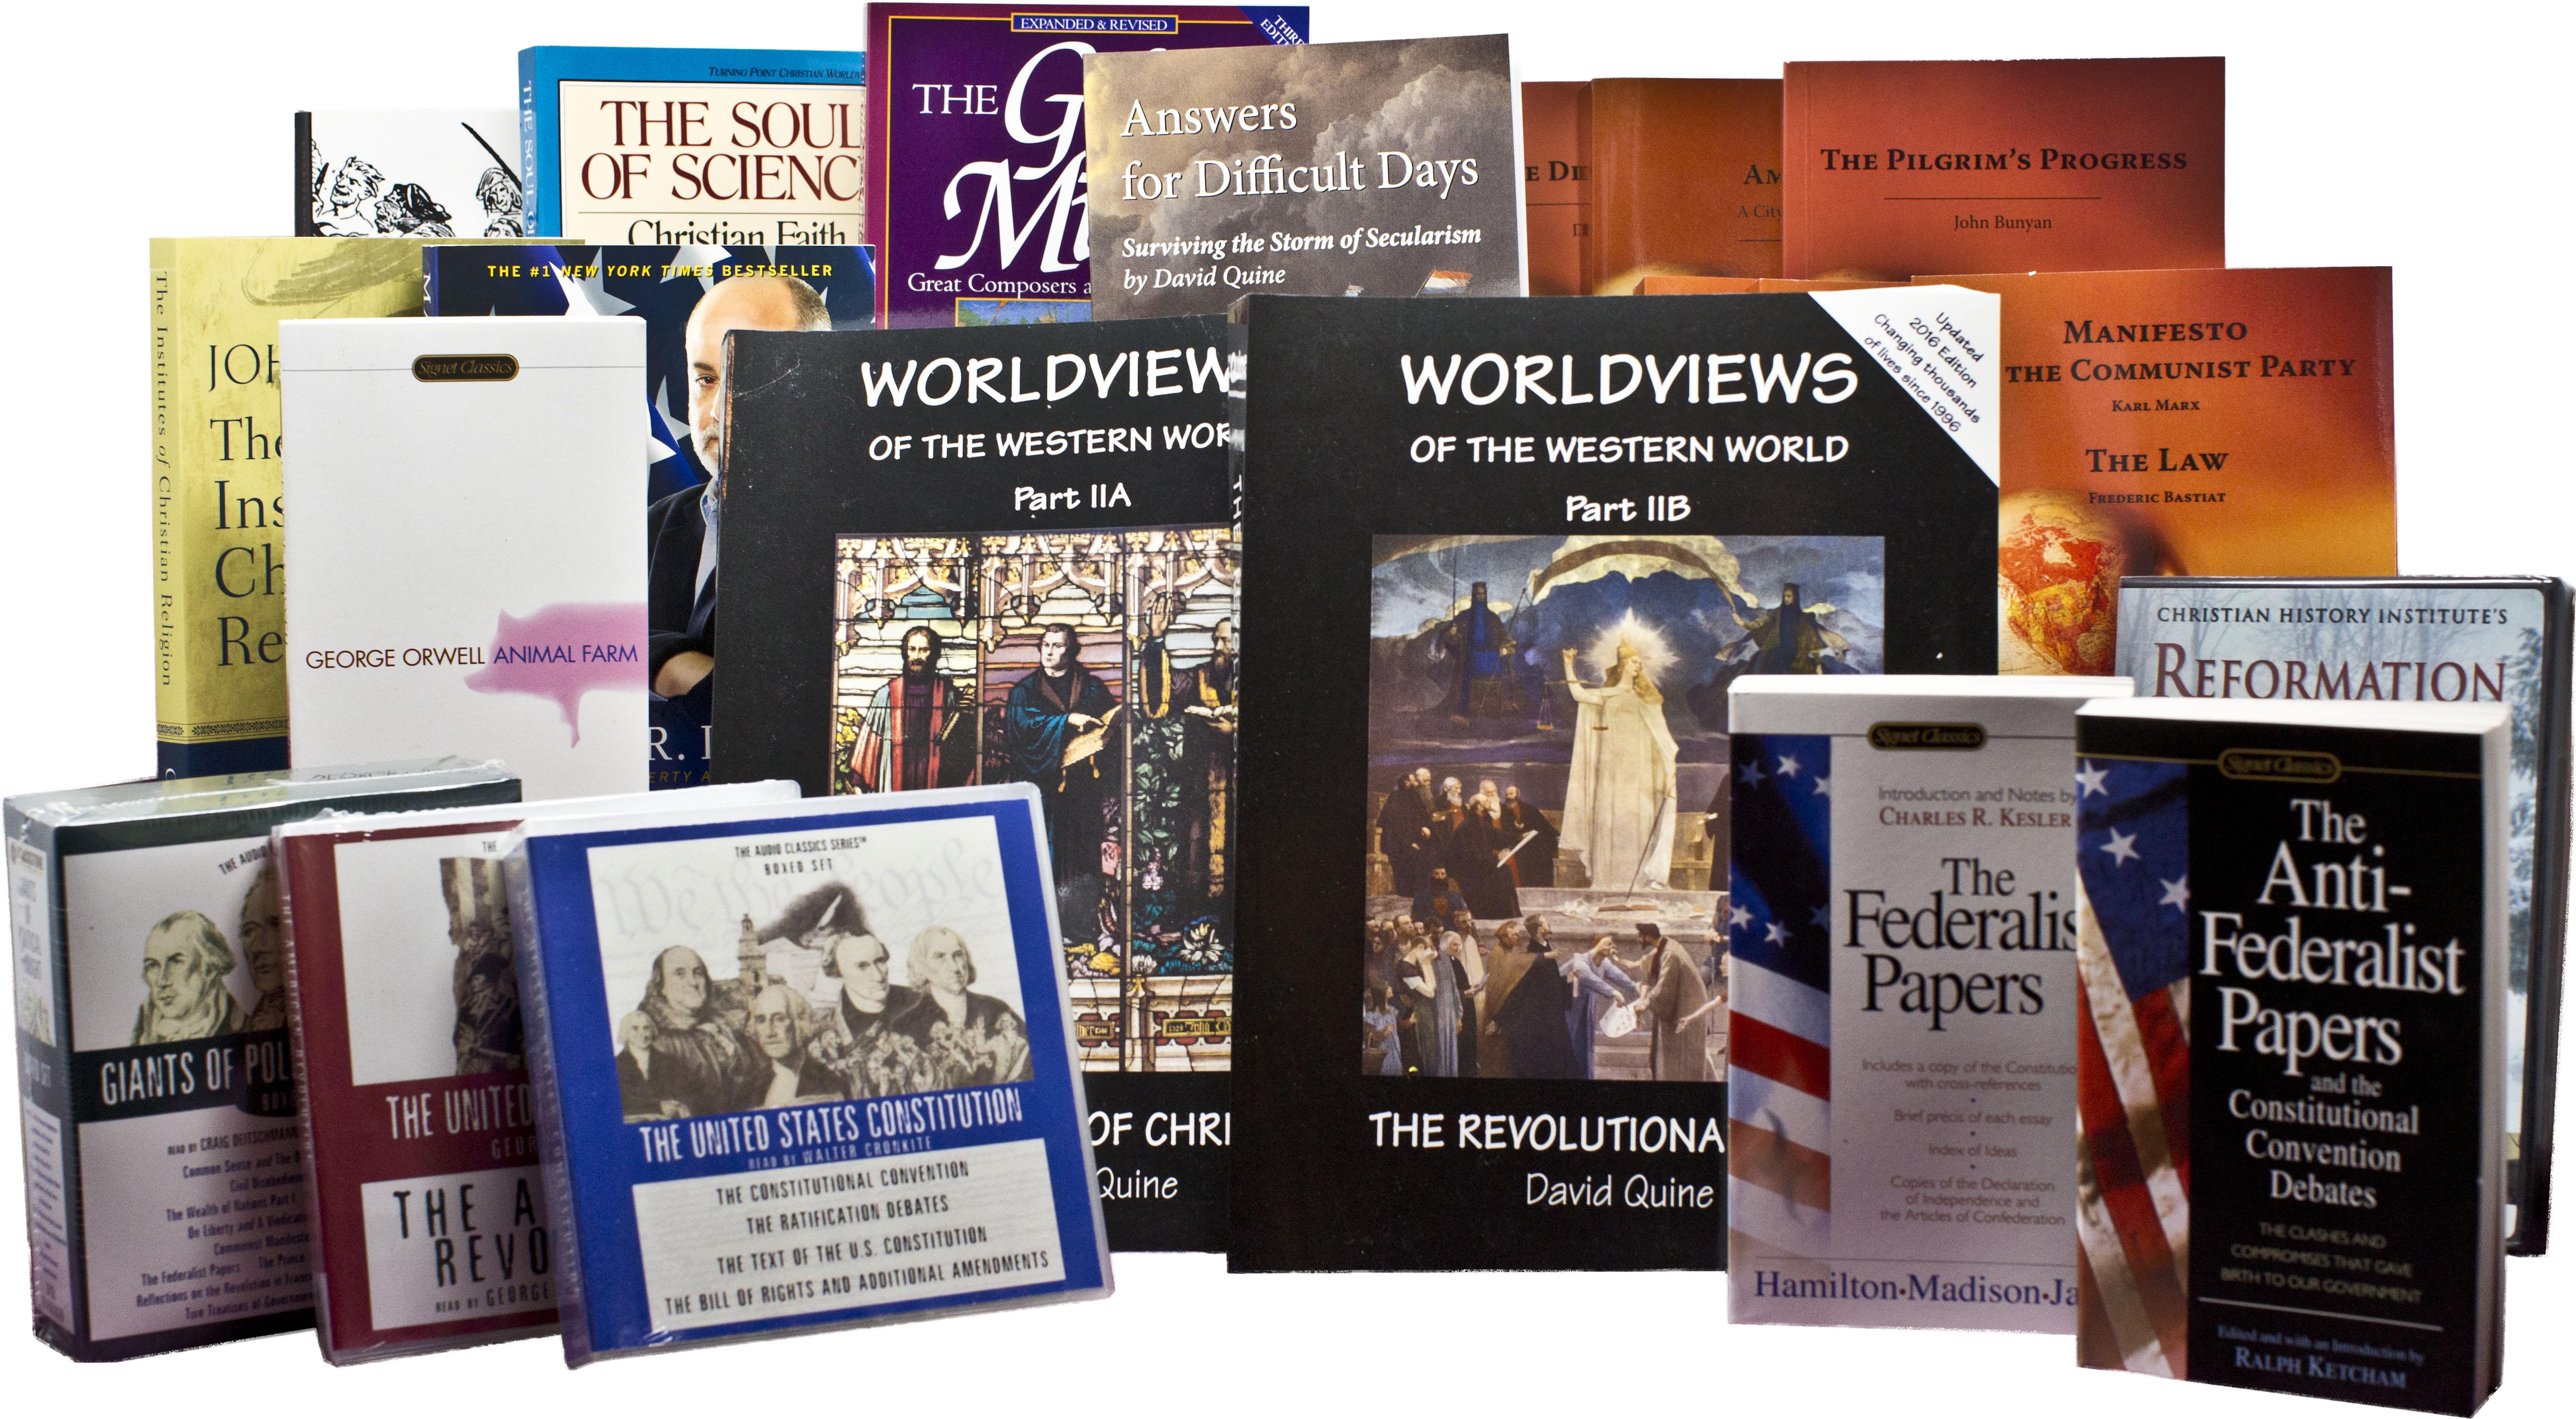 Worldviews II